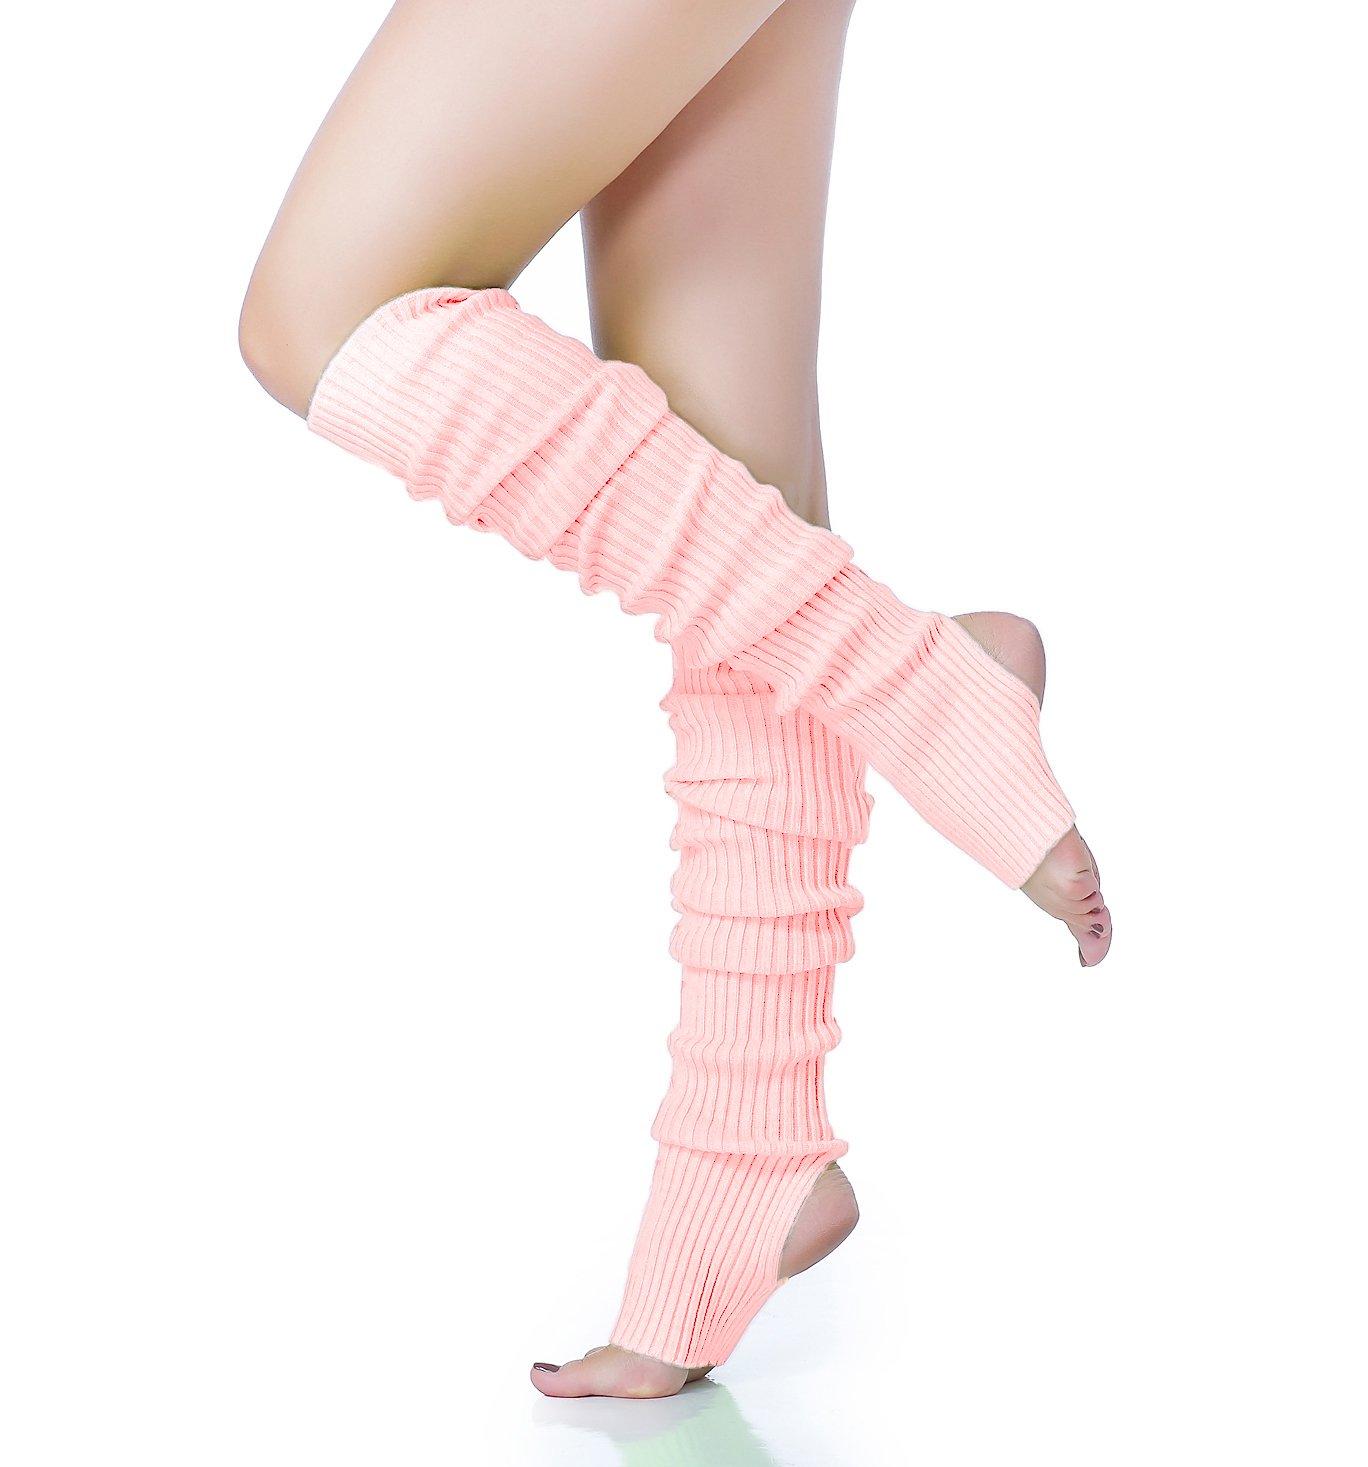 Long Leg Warmer, V28 Women Men 80s Eighty's Ribbed Knit Dance Sports Leg Warmers (Hole71-pink)